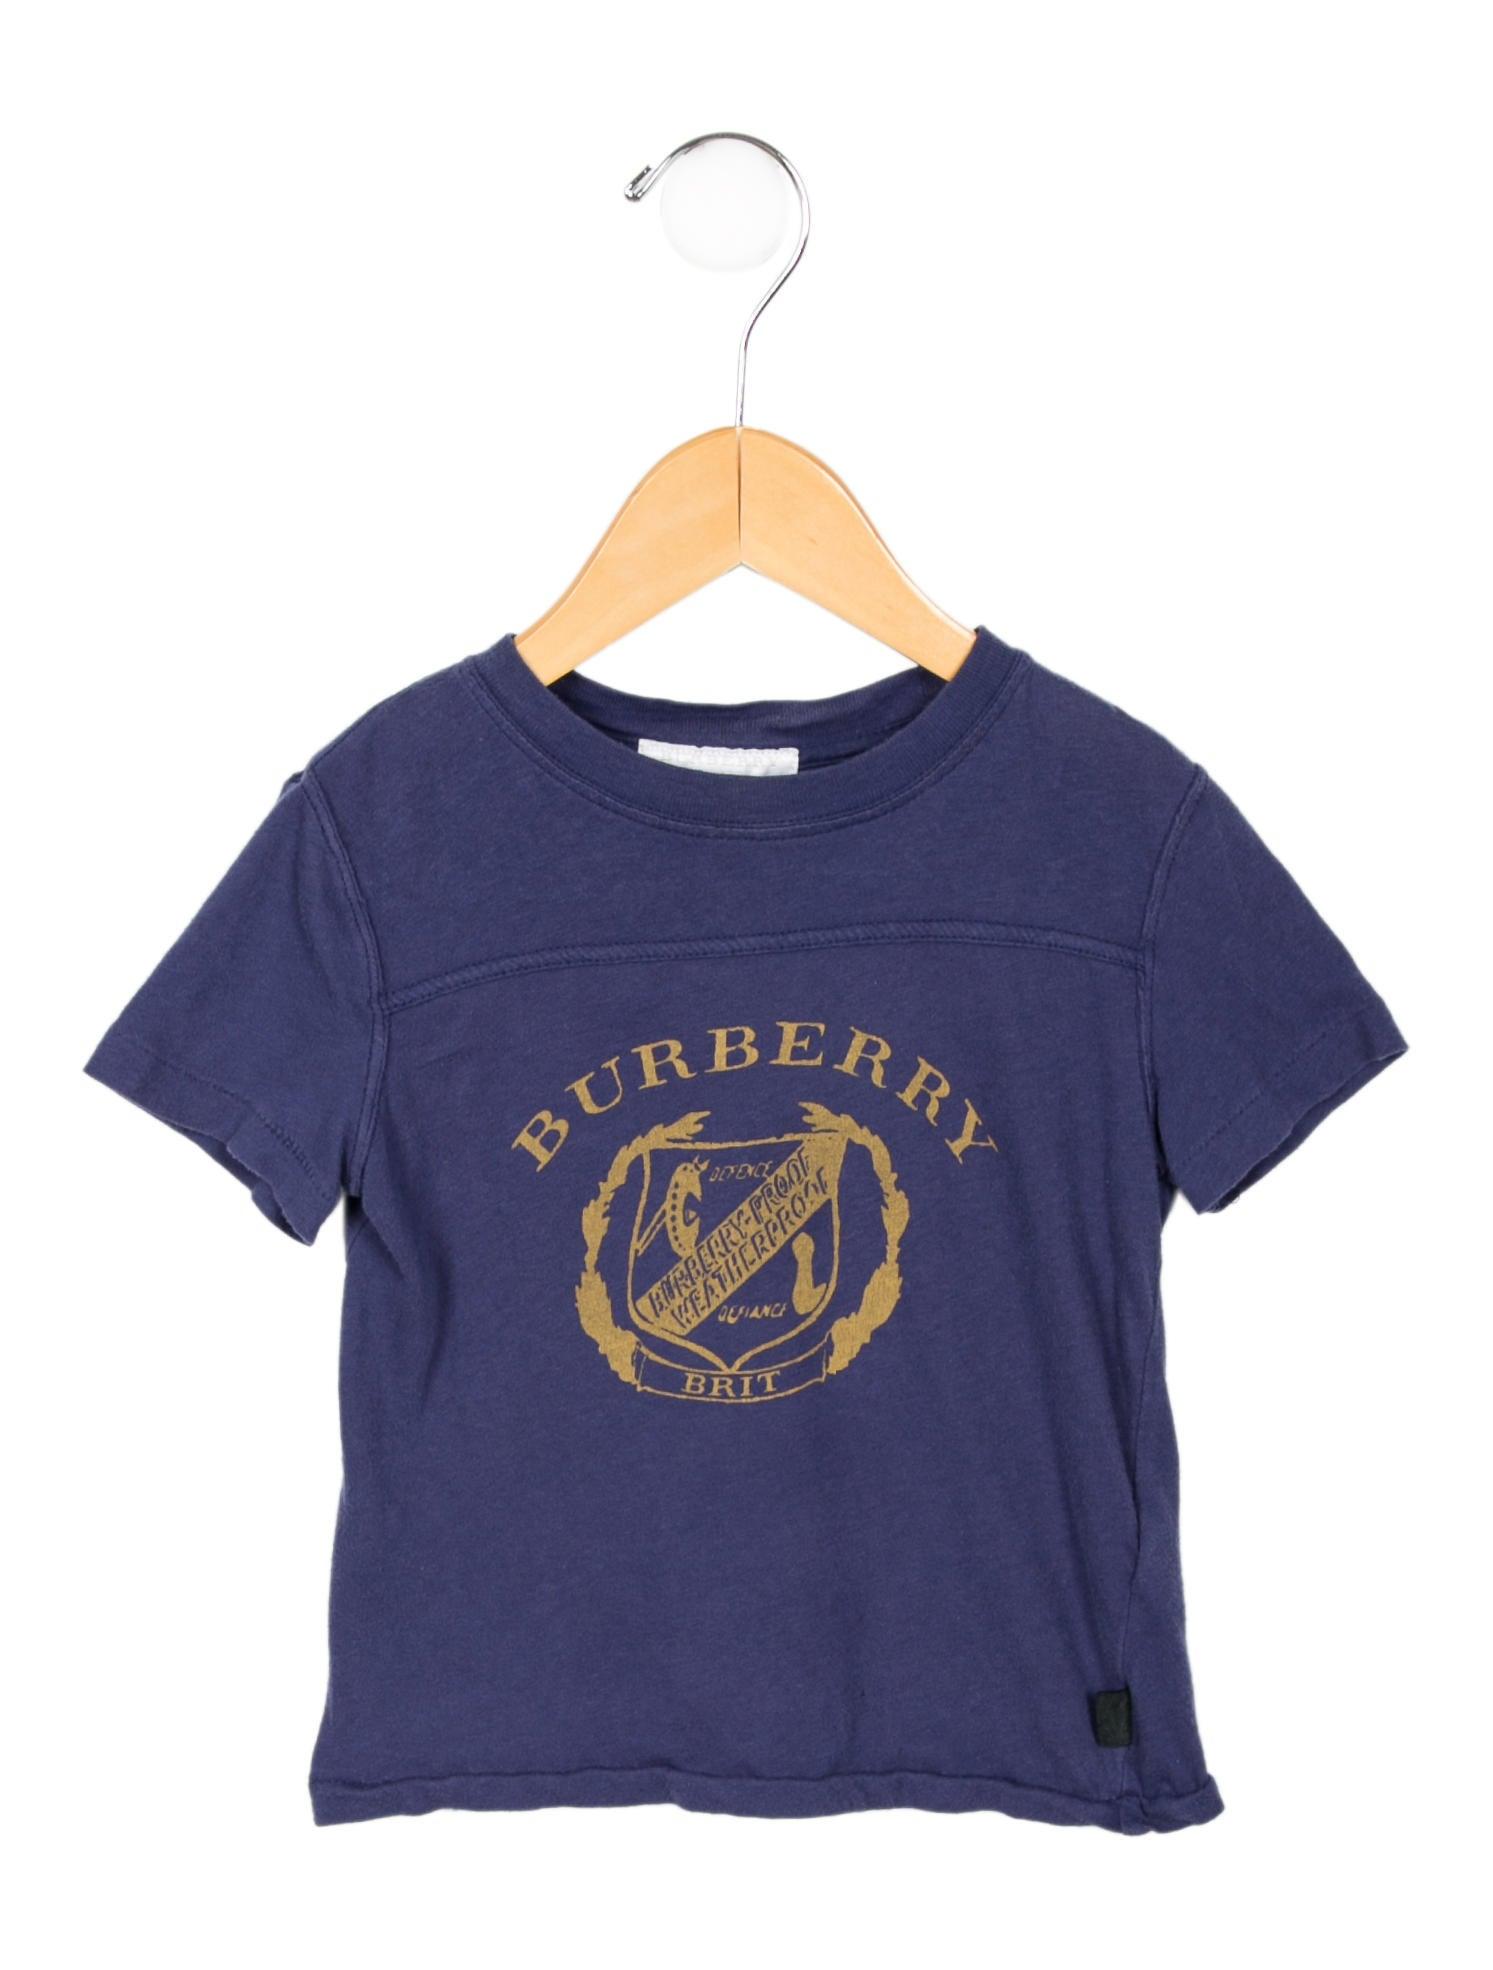 Burberry kids 39 printed crew neck t shirt girls for Toddler t shirt printing